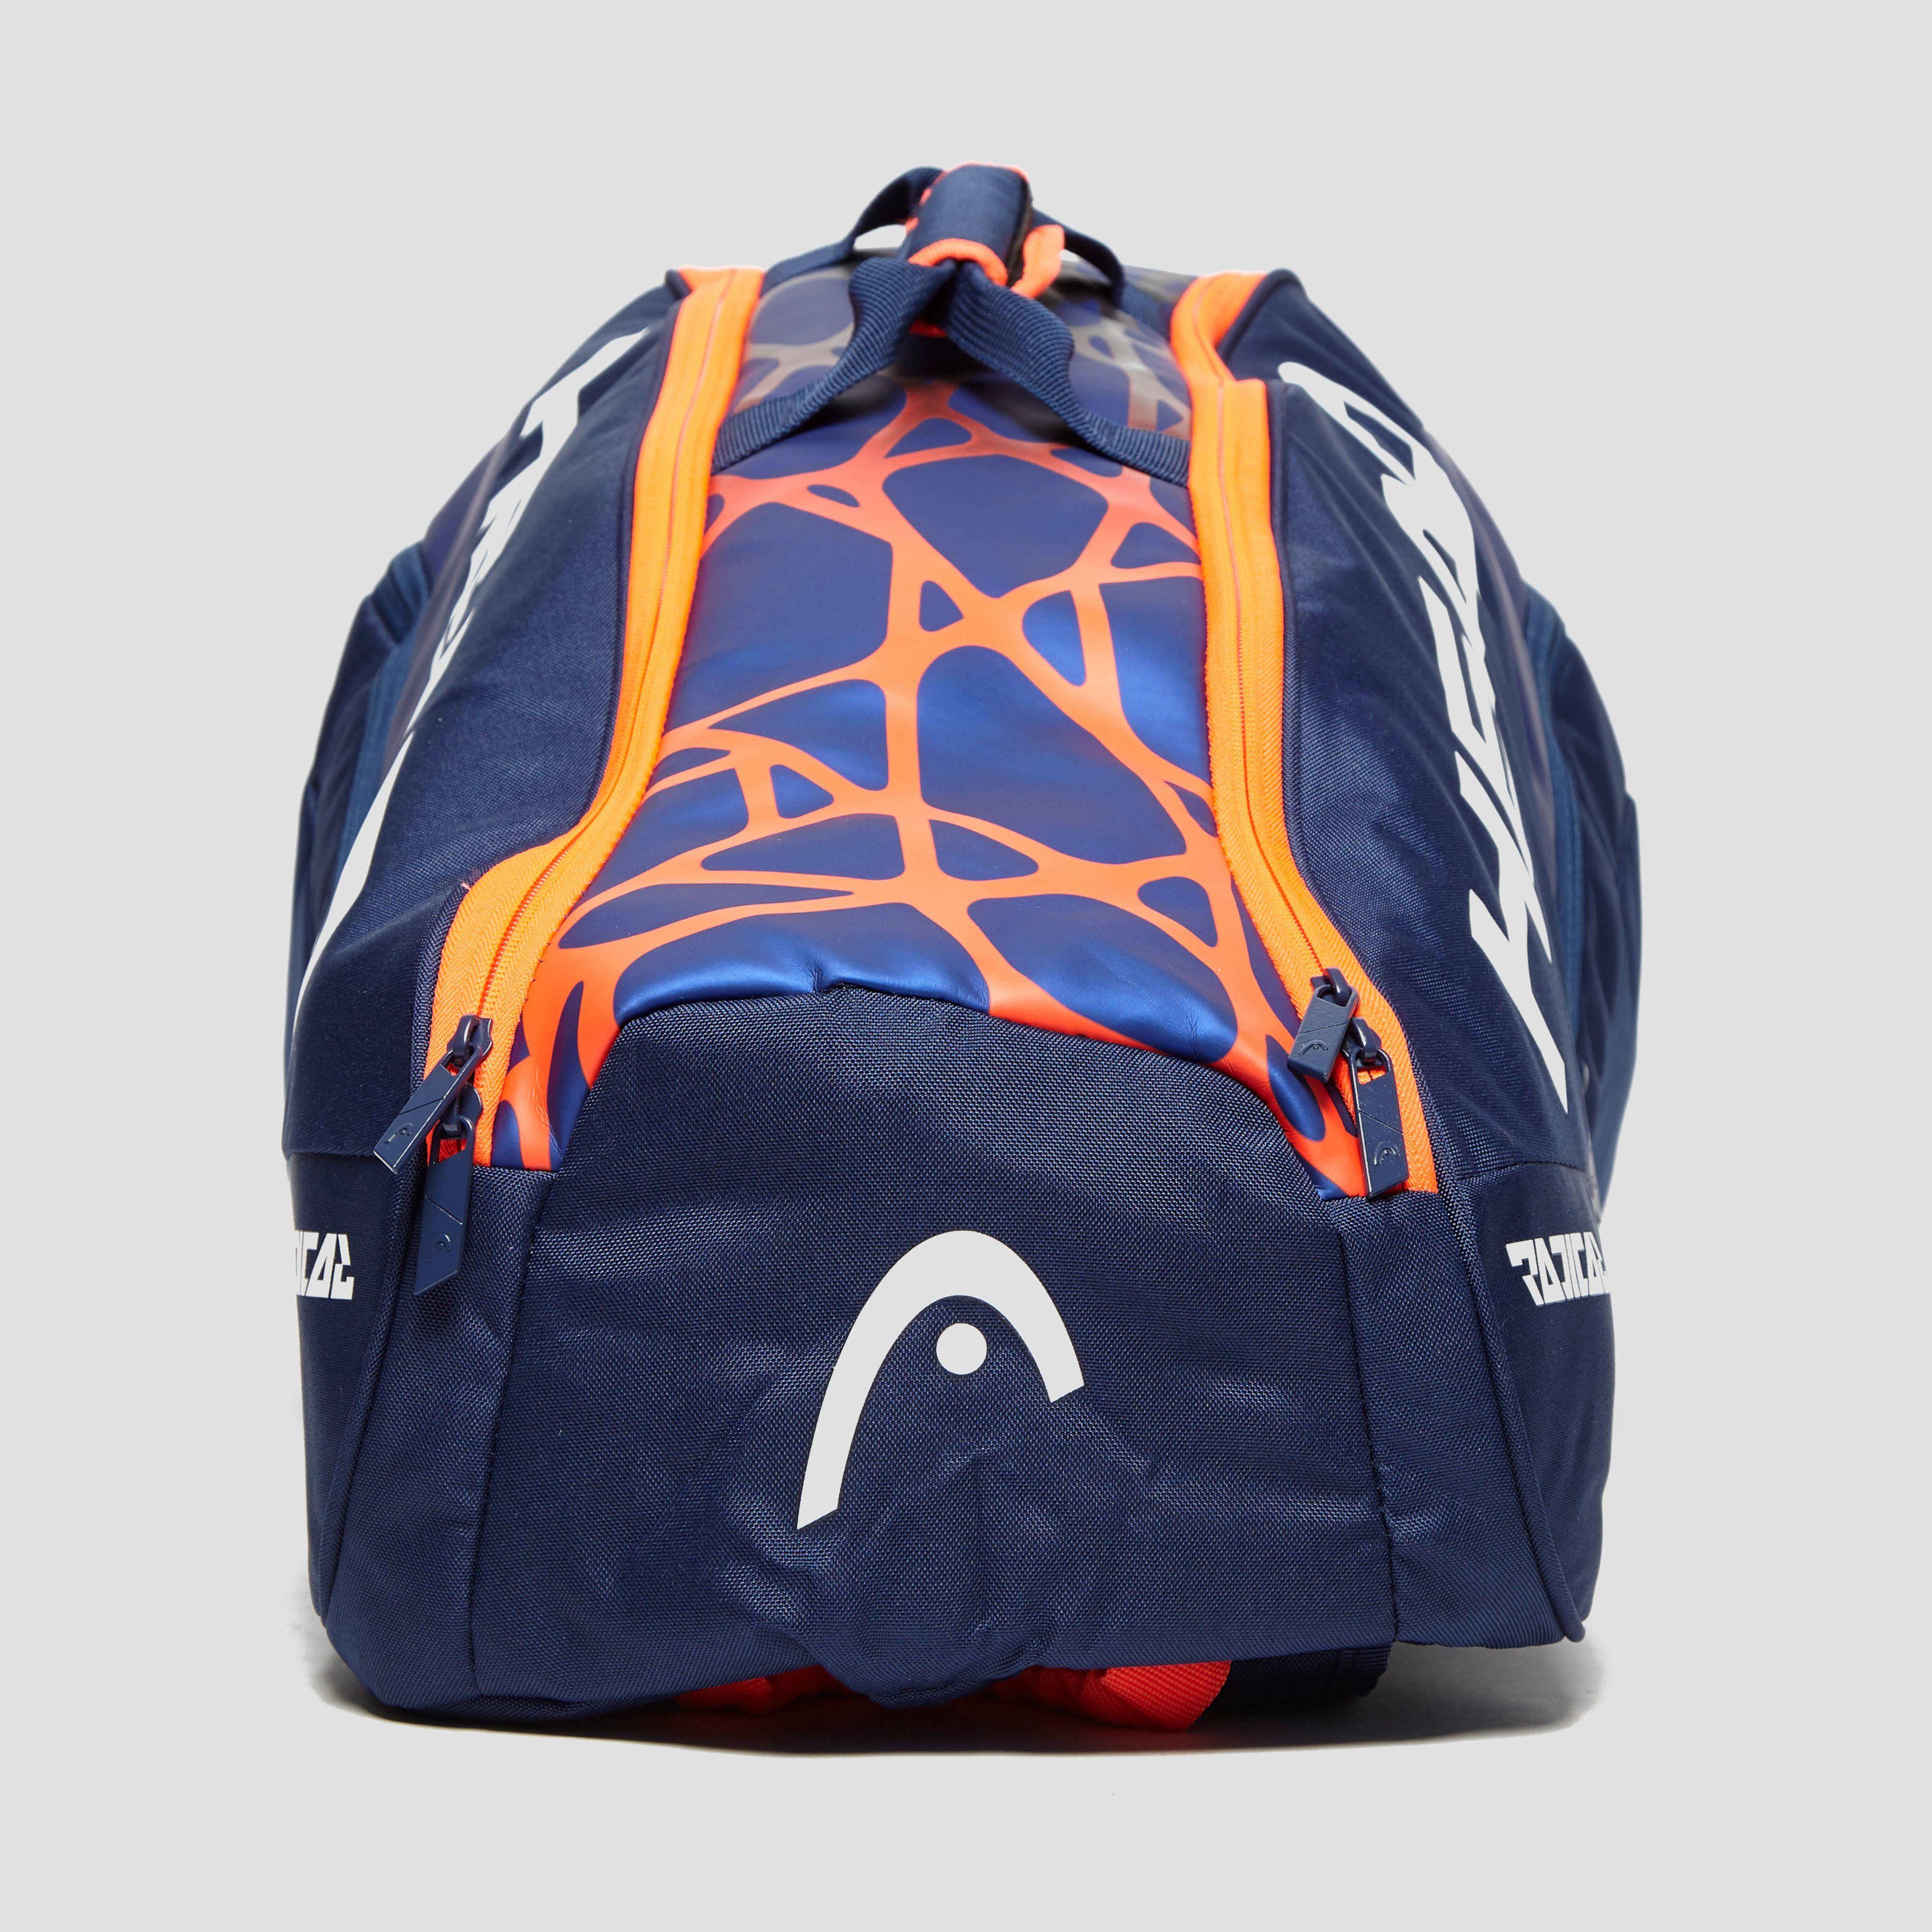 Head Radical Supercombi x9 Racket Bag